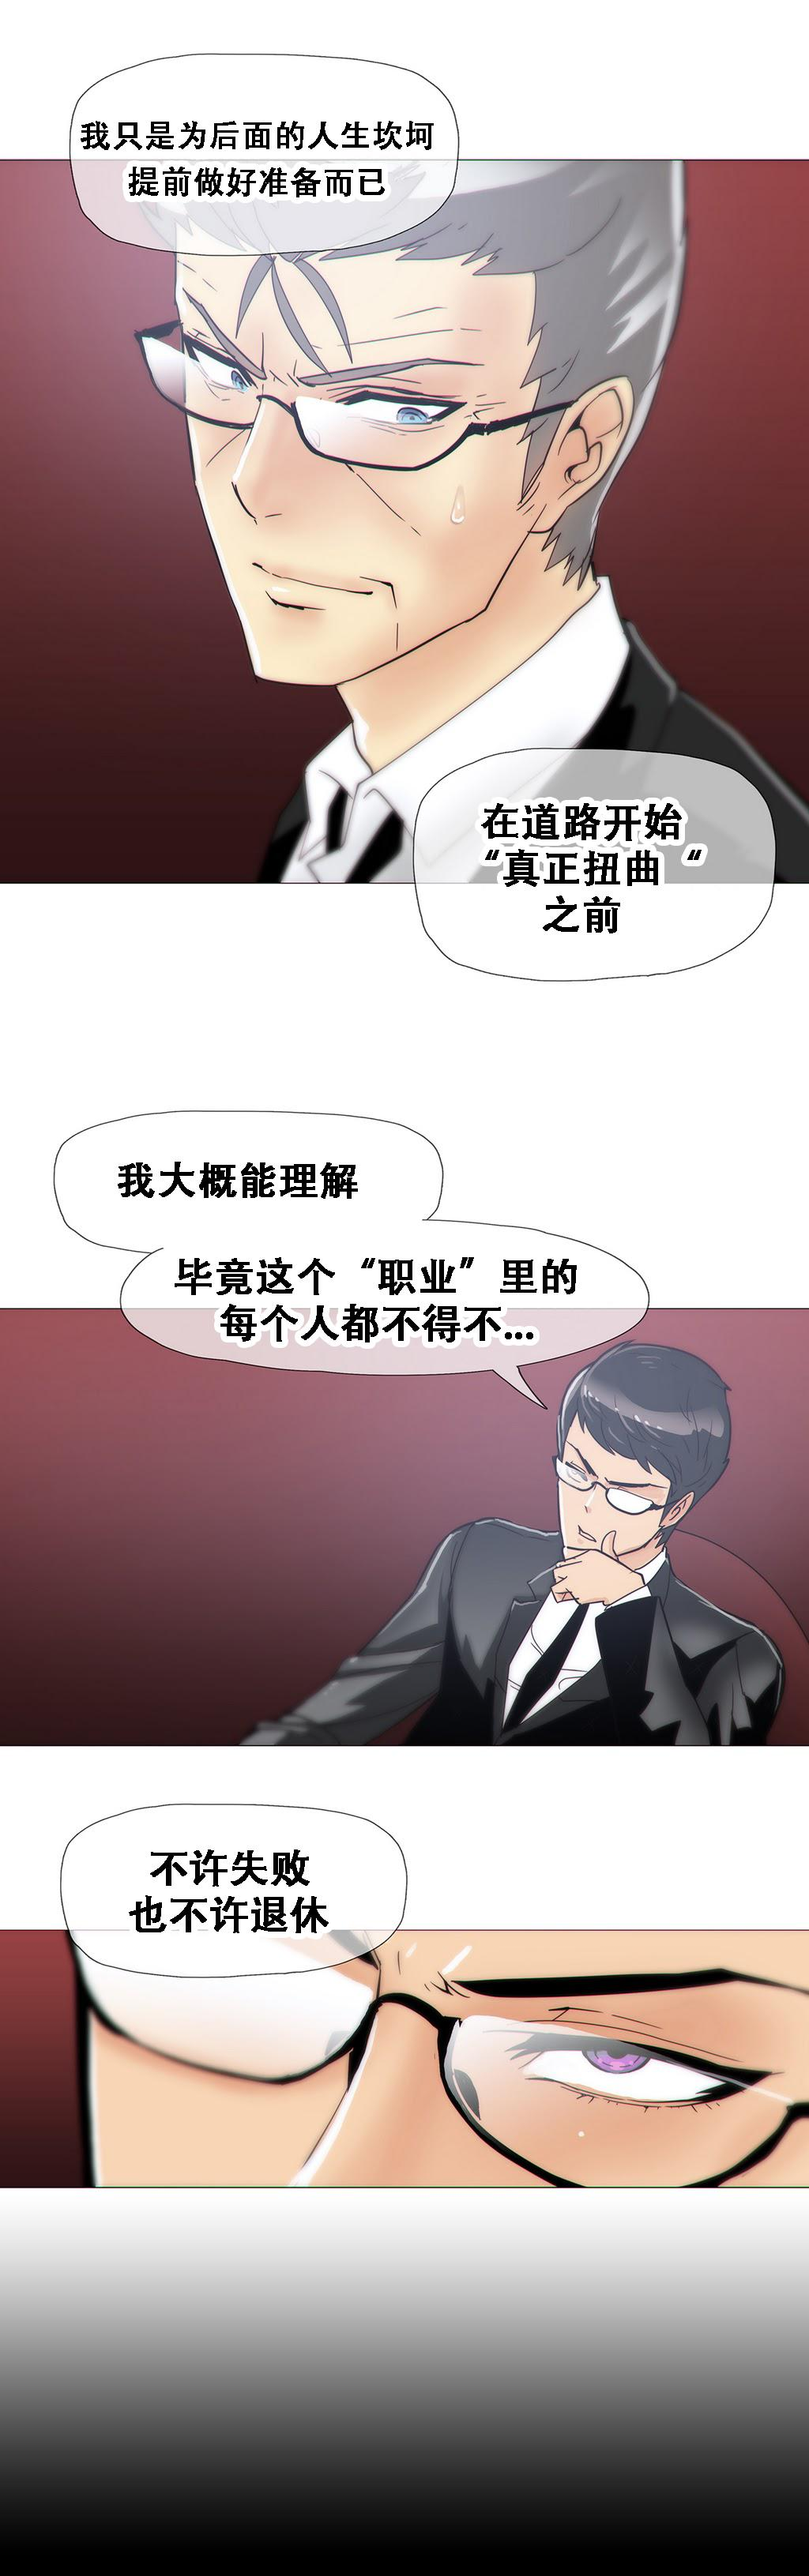 HouseHold Affairs 【卞赤鲤汉化】1~15话 346